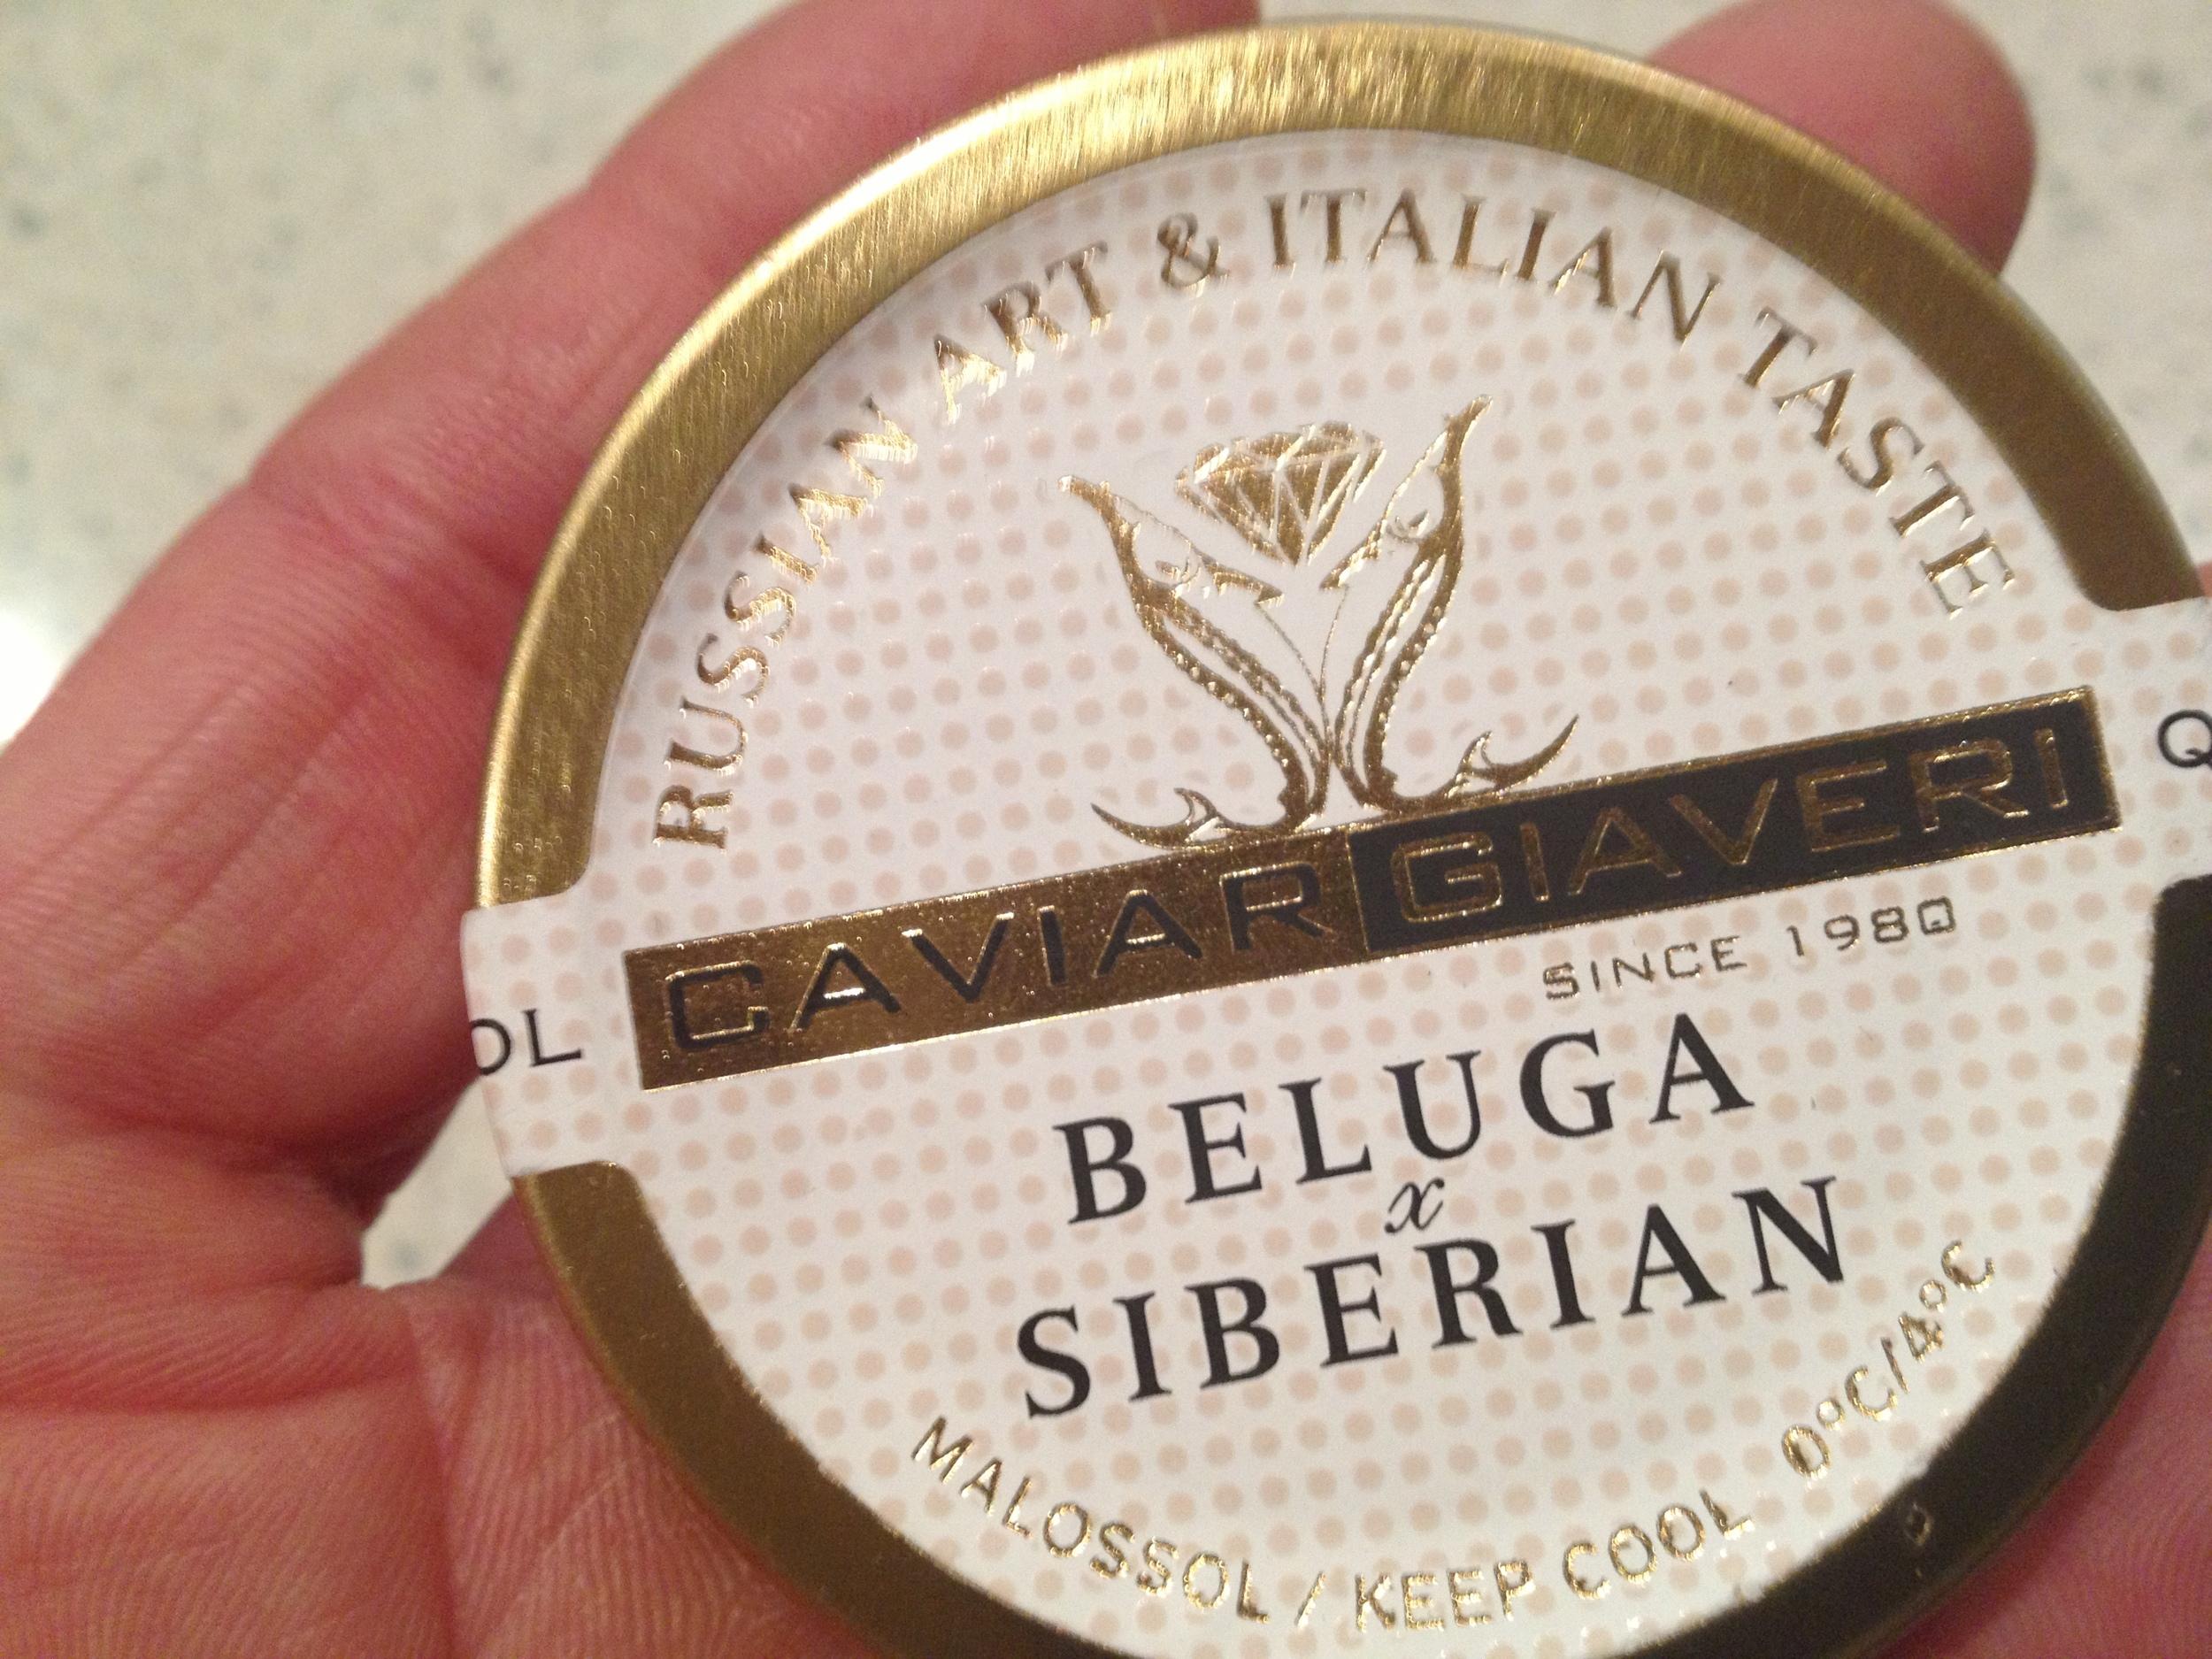 Russian caviar...